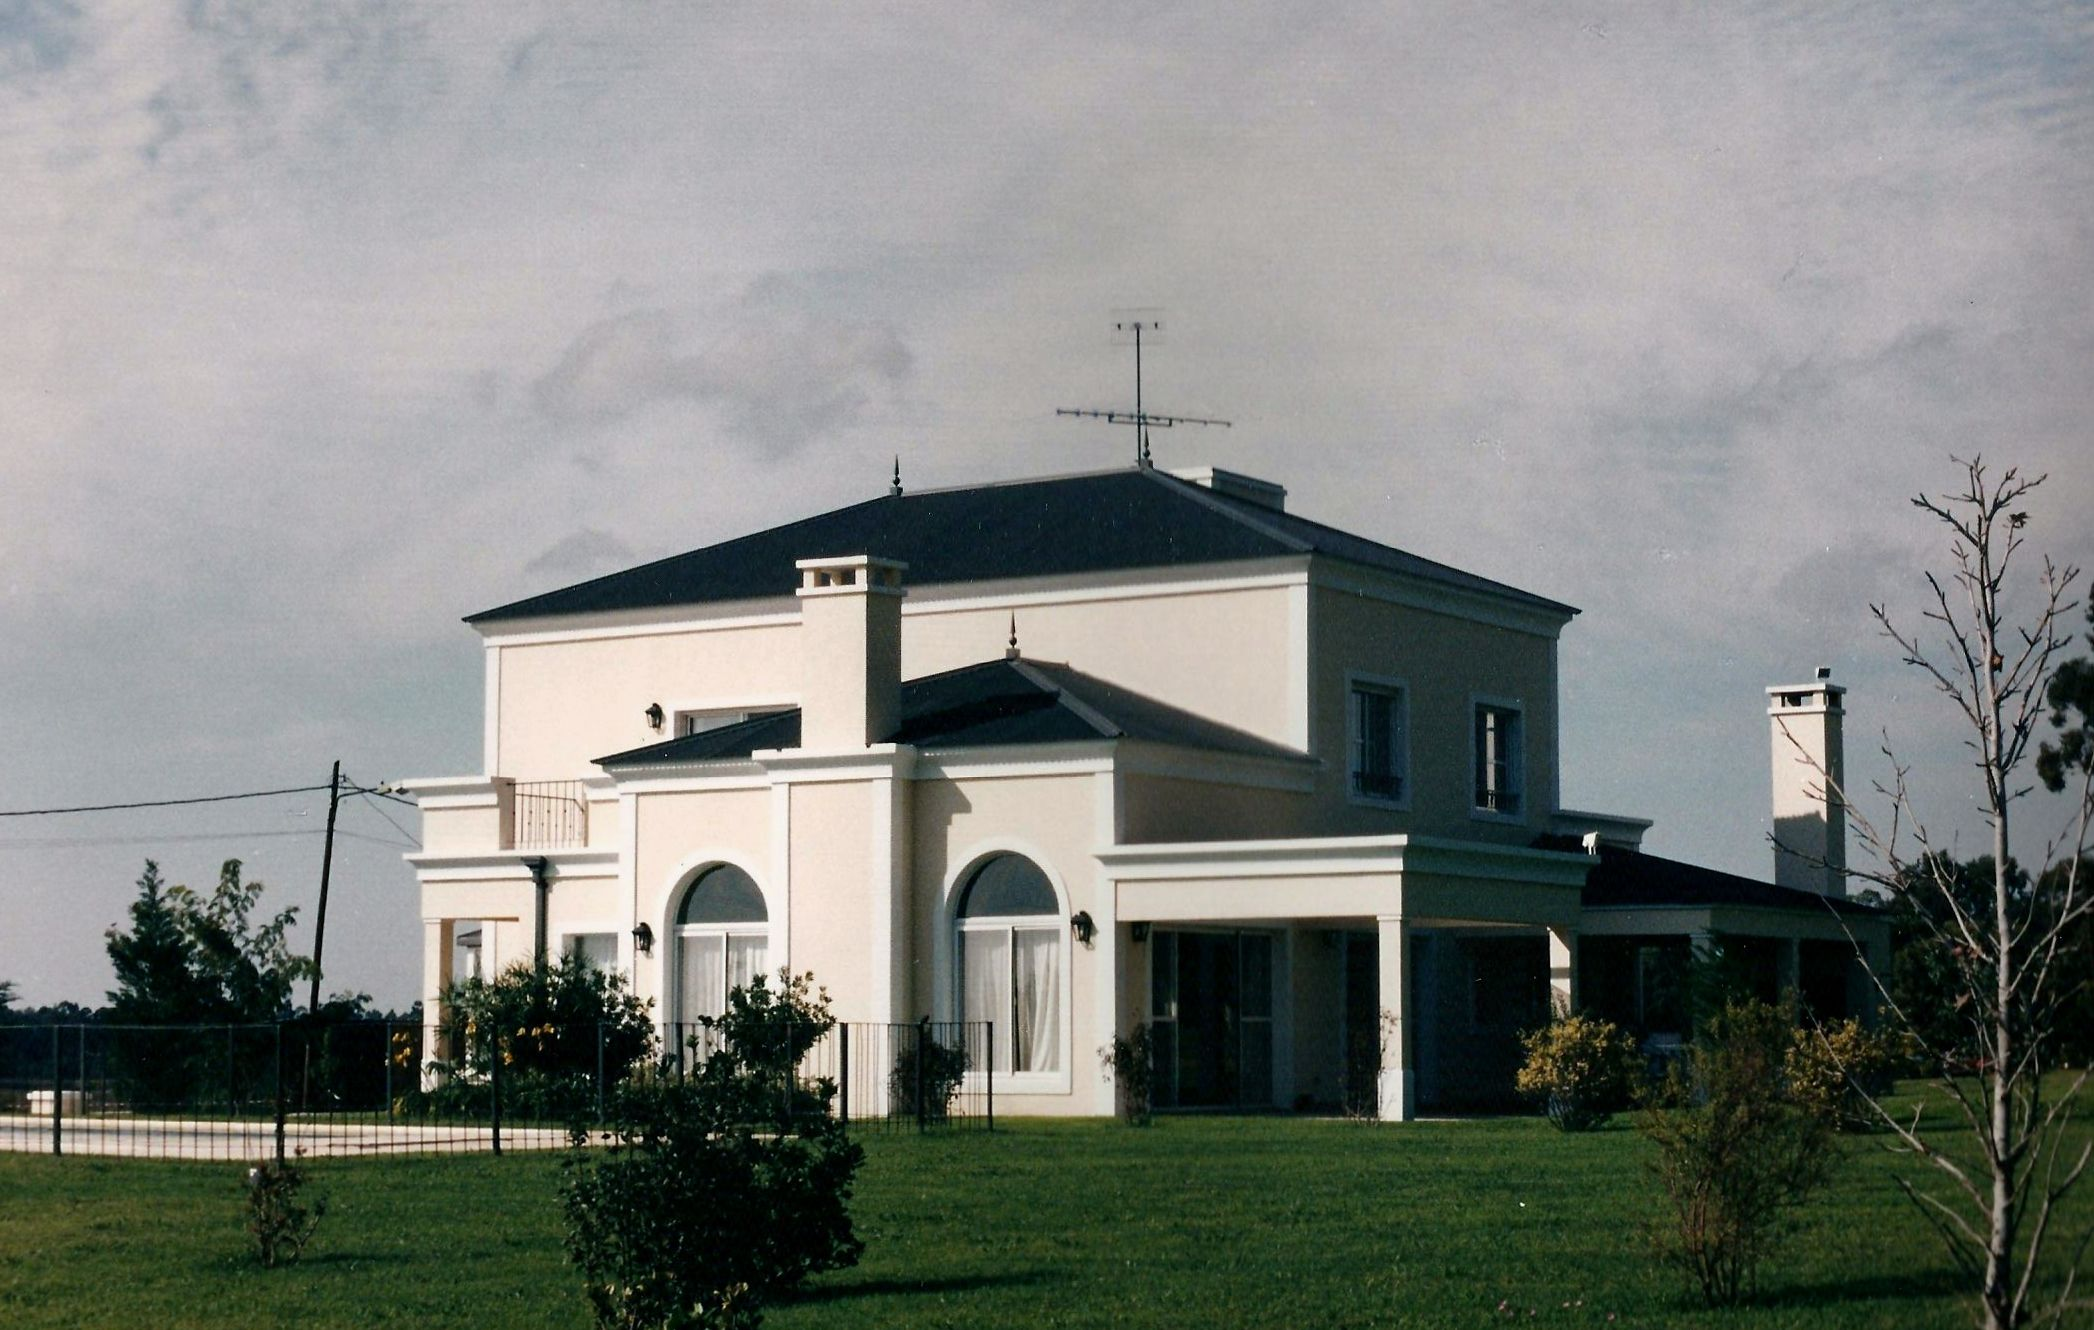 Casa cl sica con techo de chapa en newman cc estudio for Casa clasica techo inclinado procrear